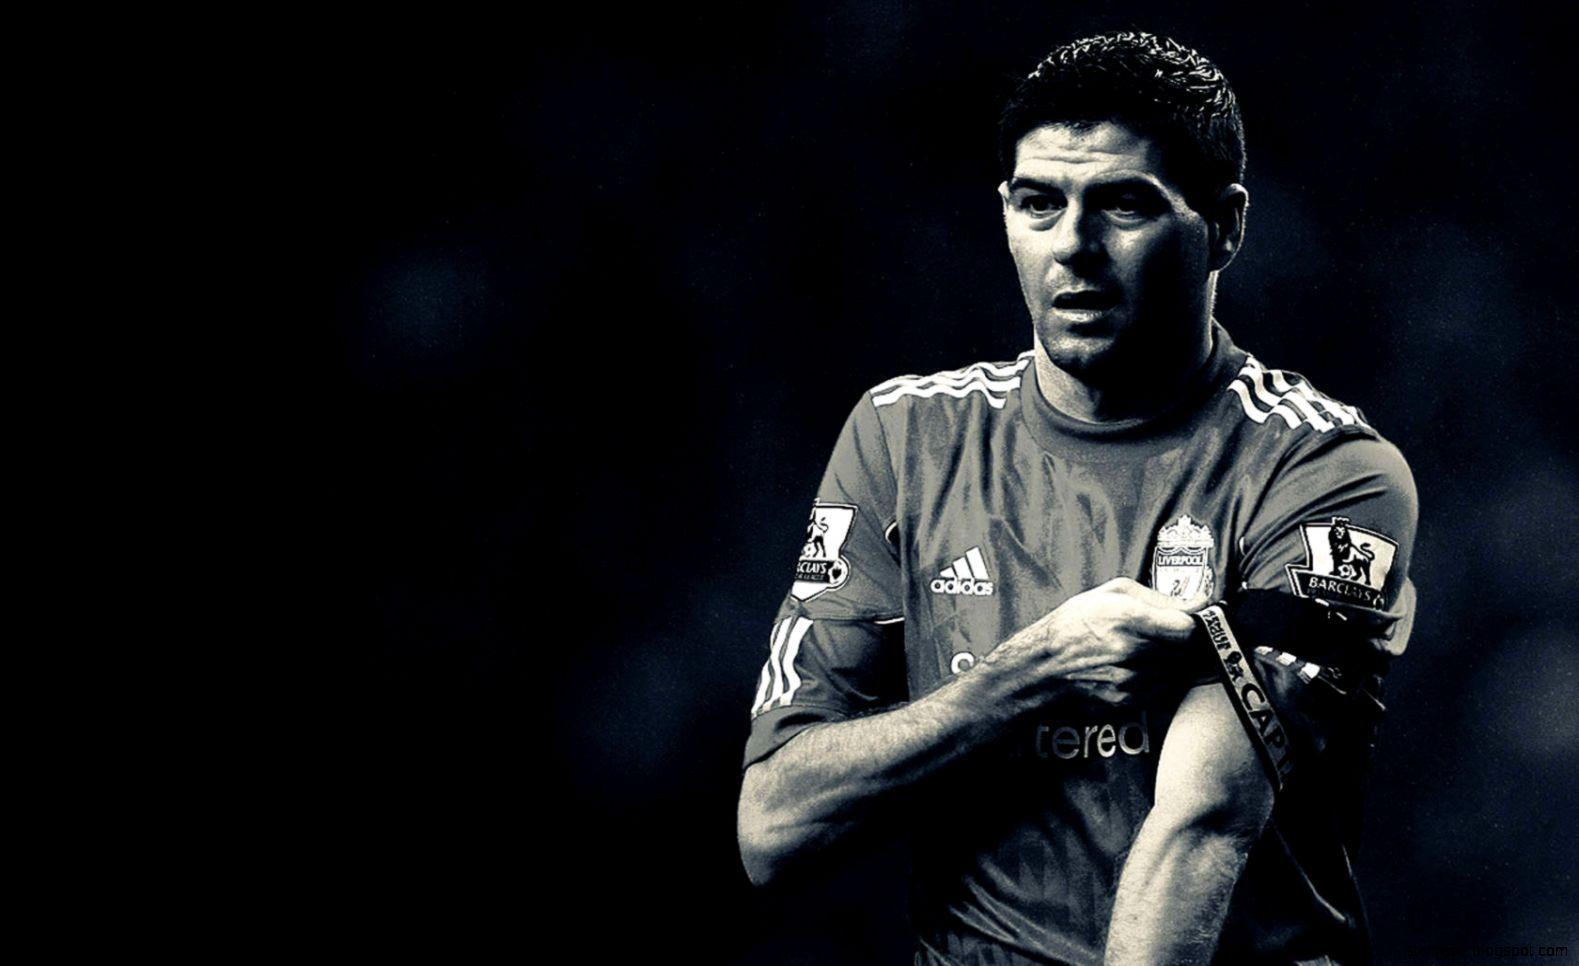 Steven Gerrard Footballer